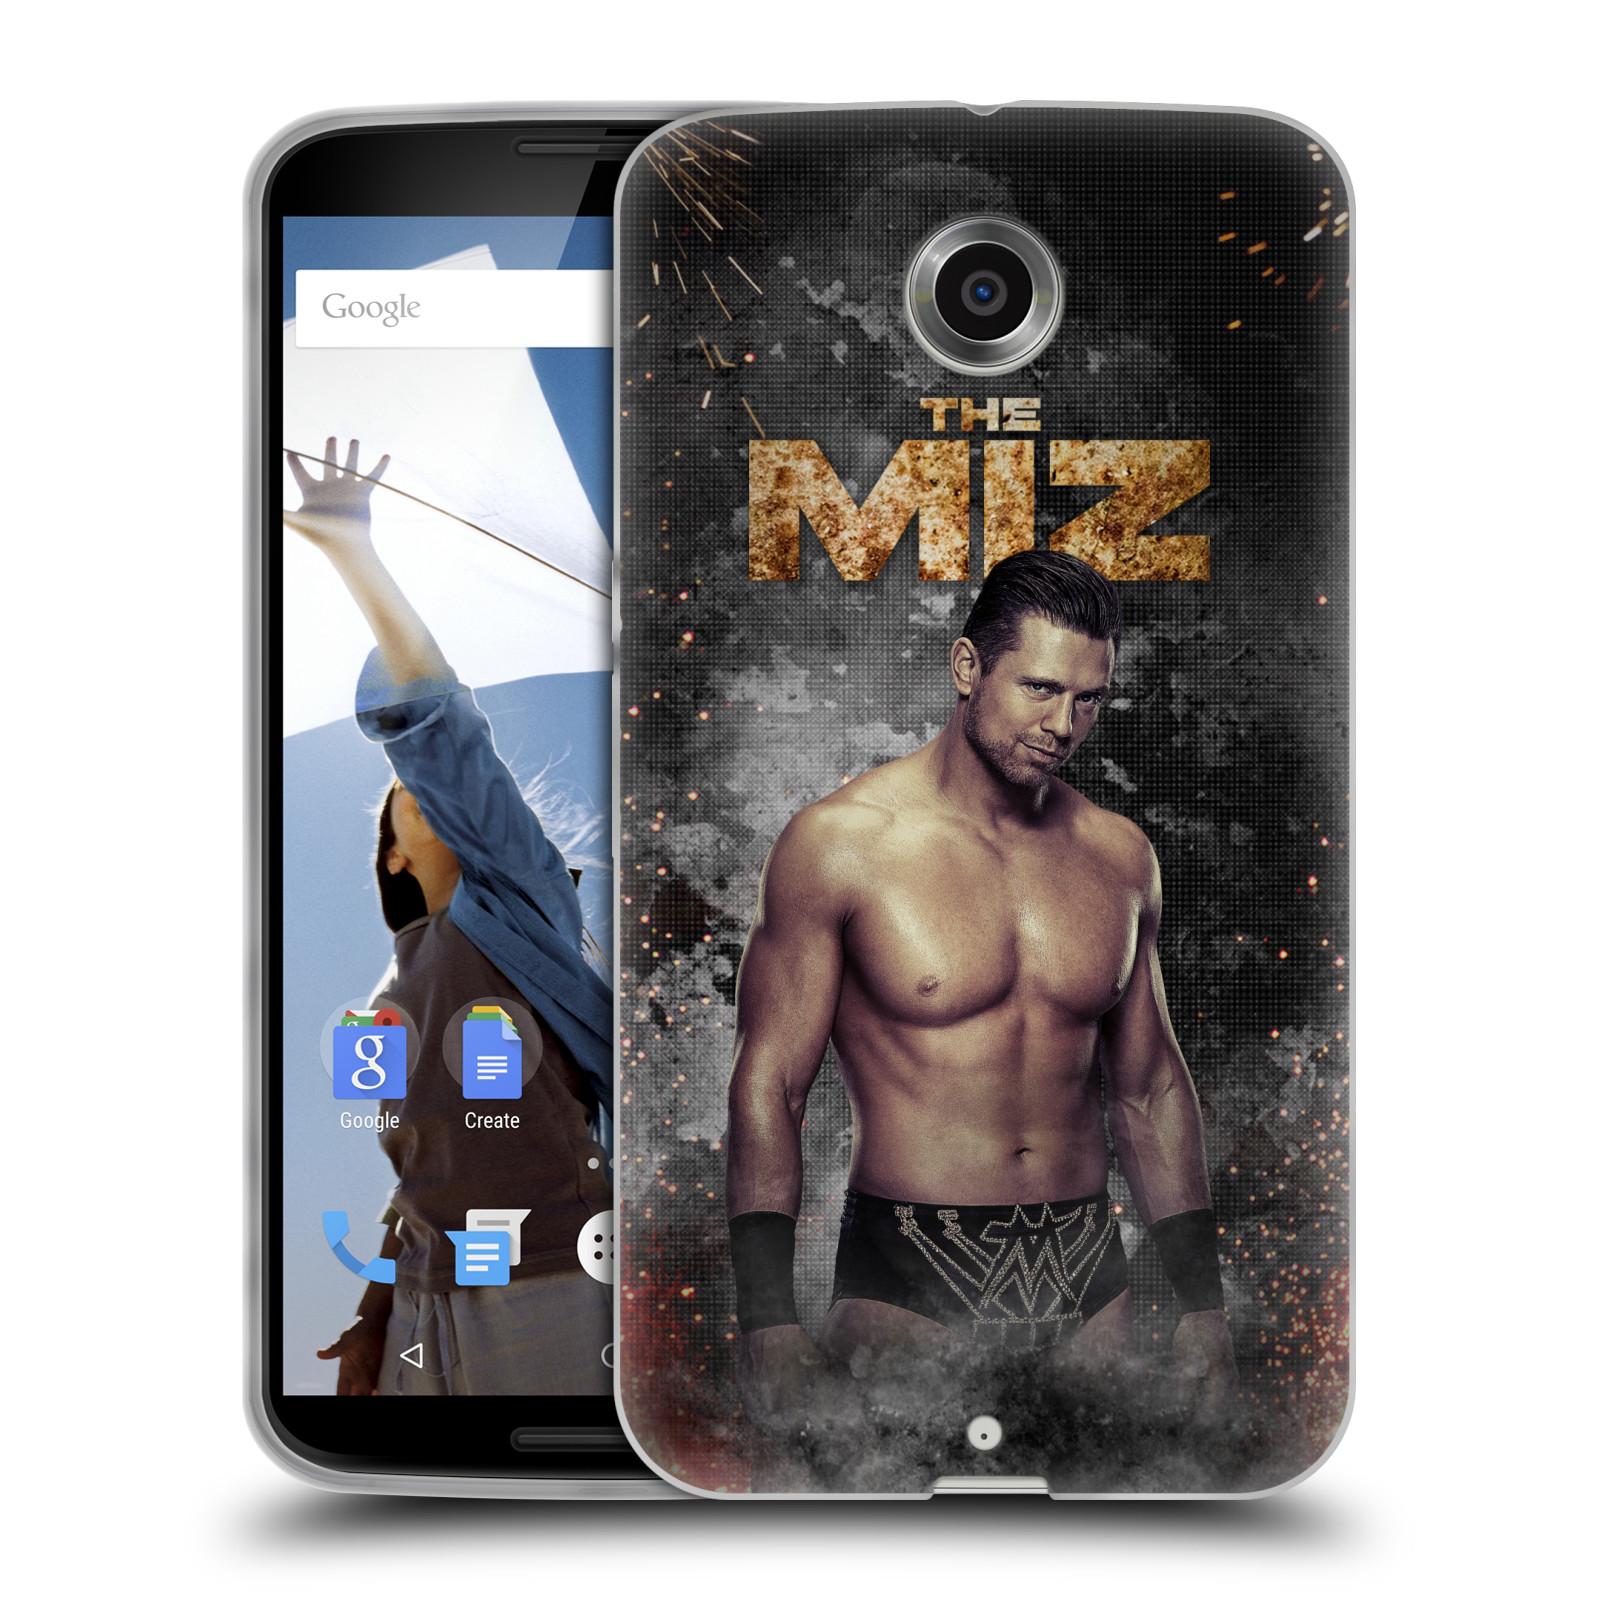 OFFICIAL WWE THE MIZ SOFT GEL CASE FOR MOTOROLA PHONES 2